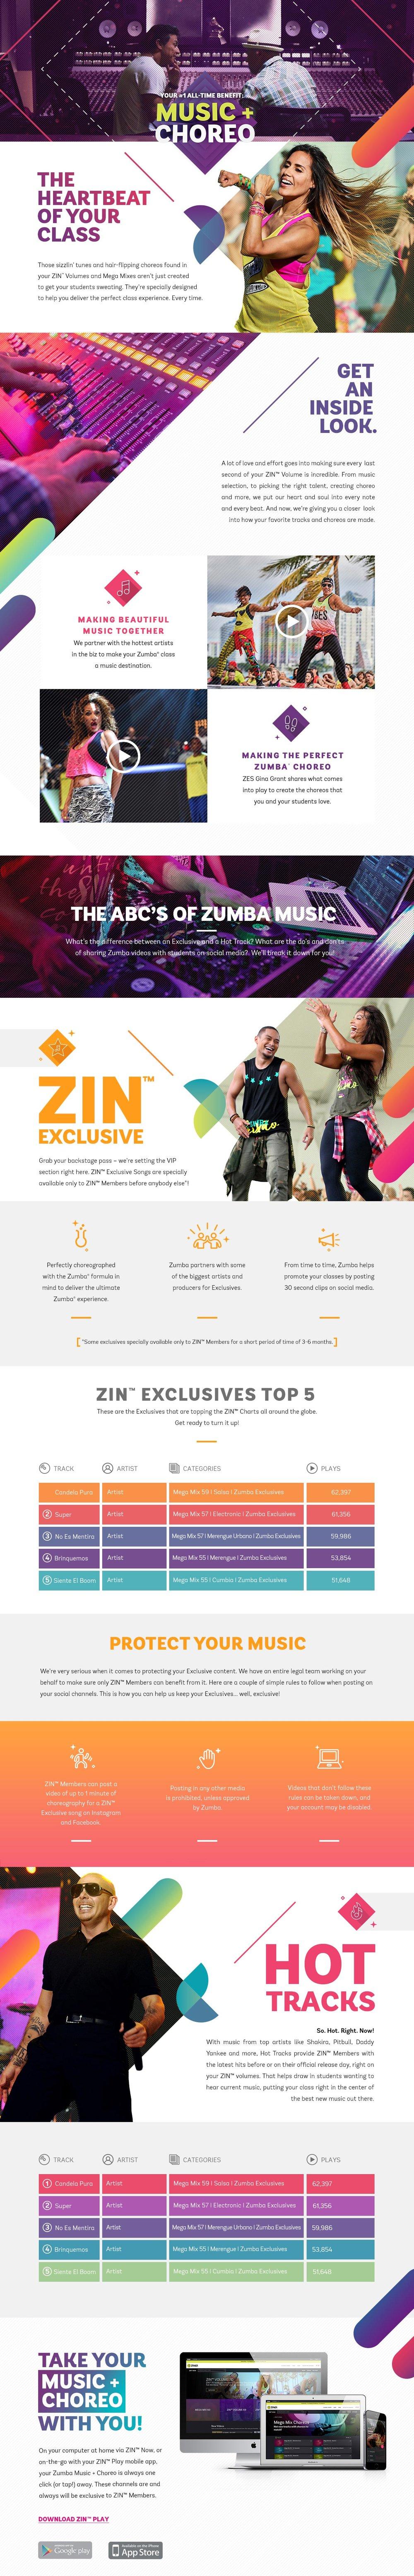 ZIN20171221_ZIN_Benefit_Campaign_LANDING_PAGE_ALL4-copy.jpg